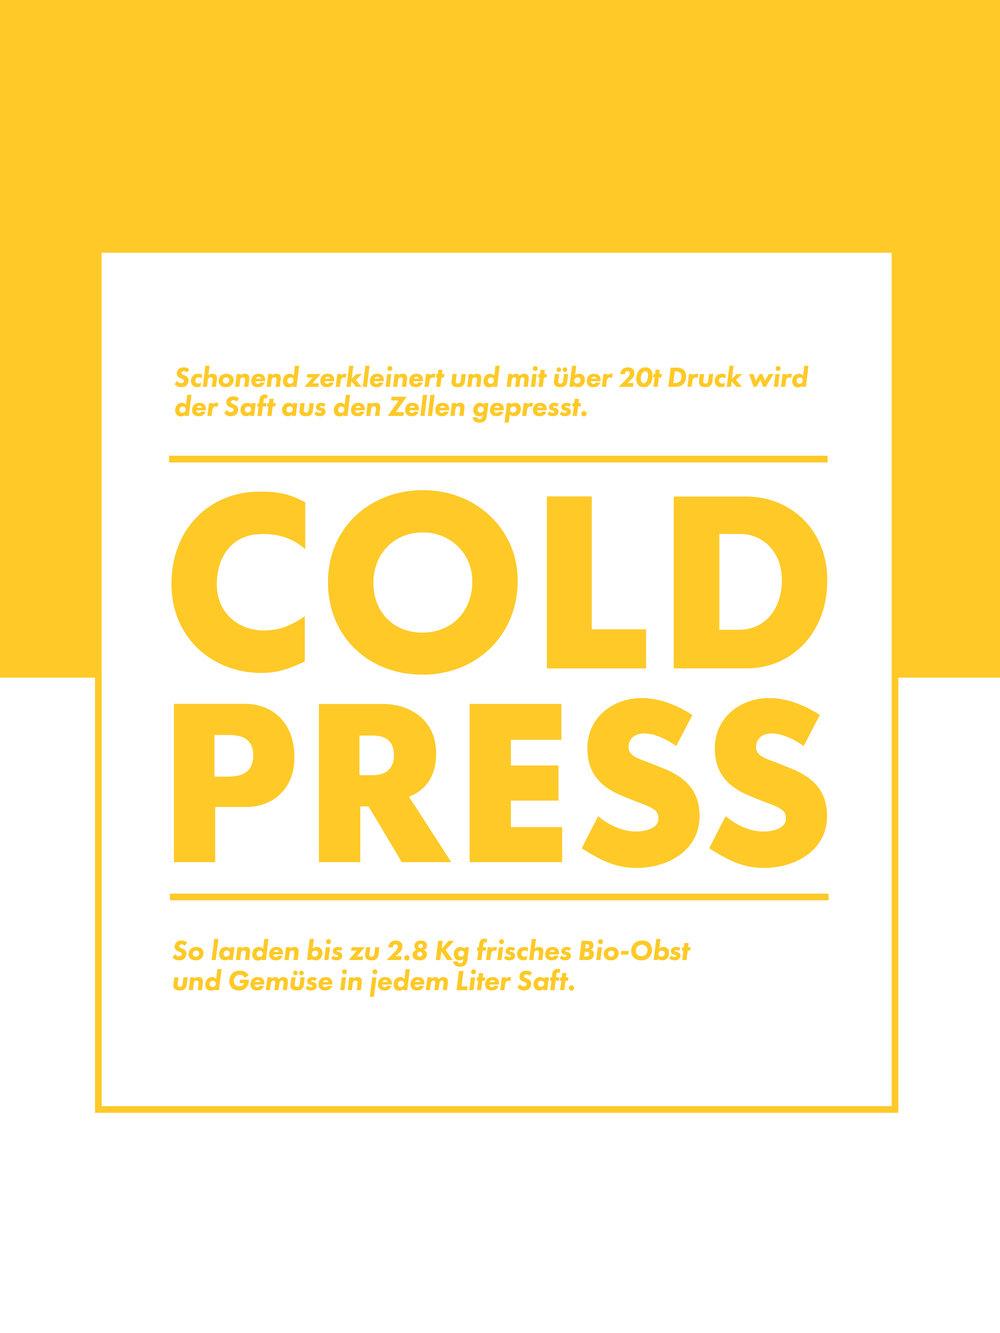 COLD-PRESS.jpg